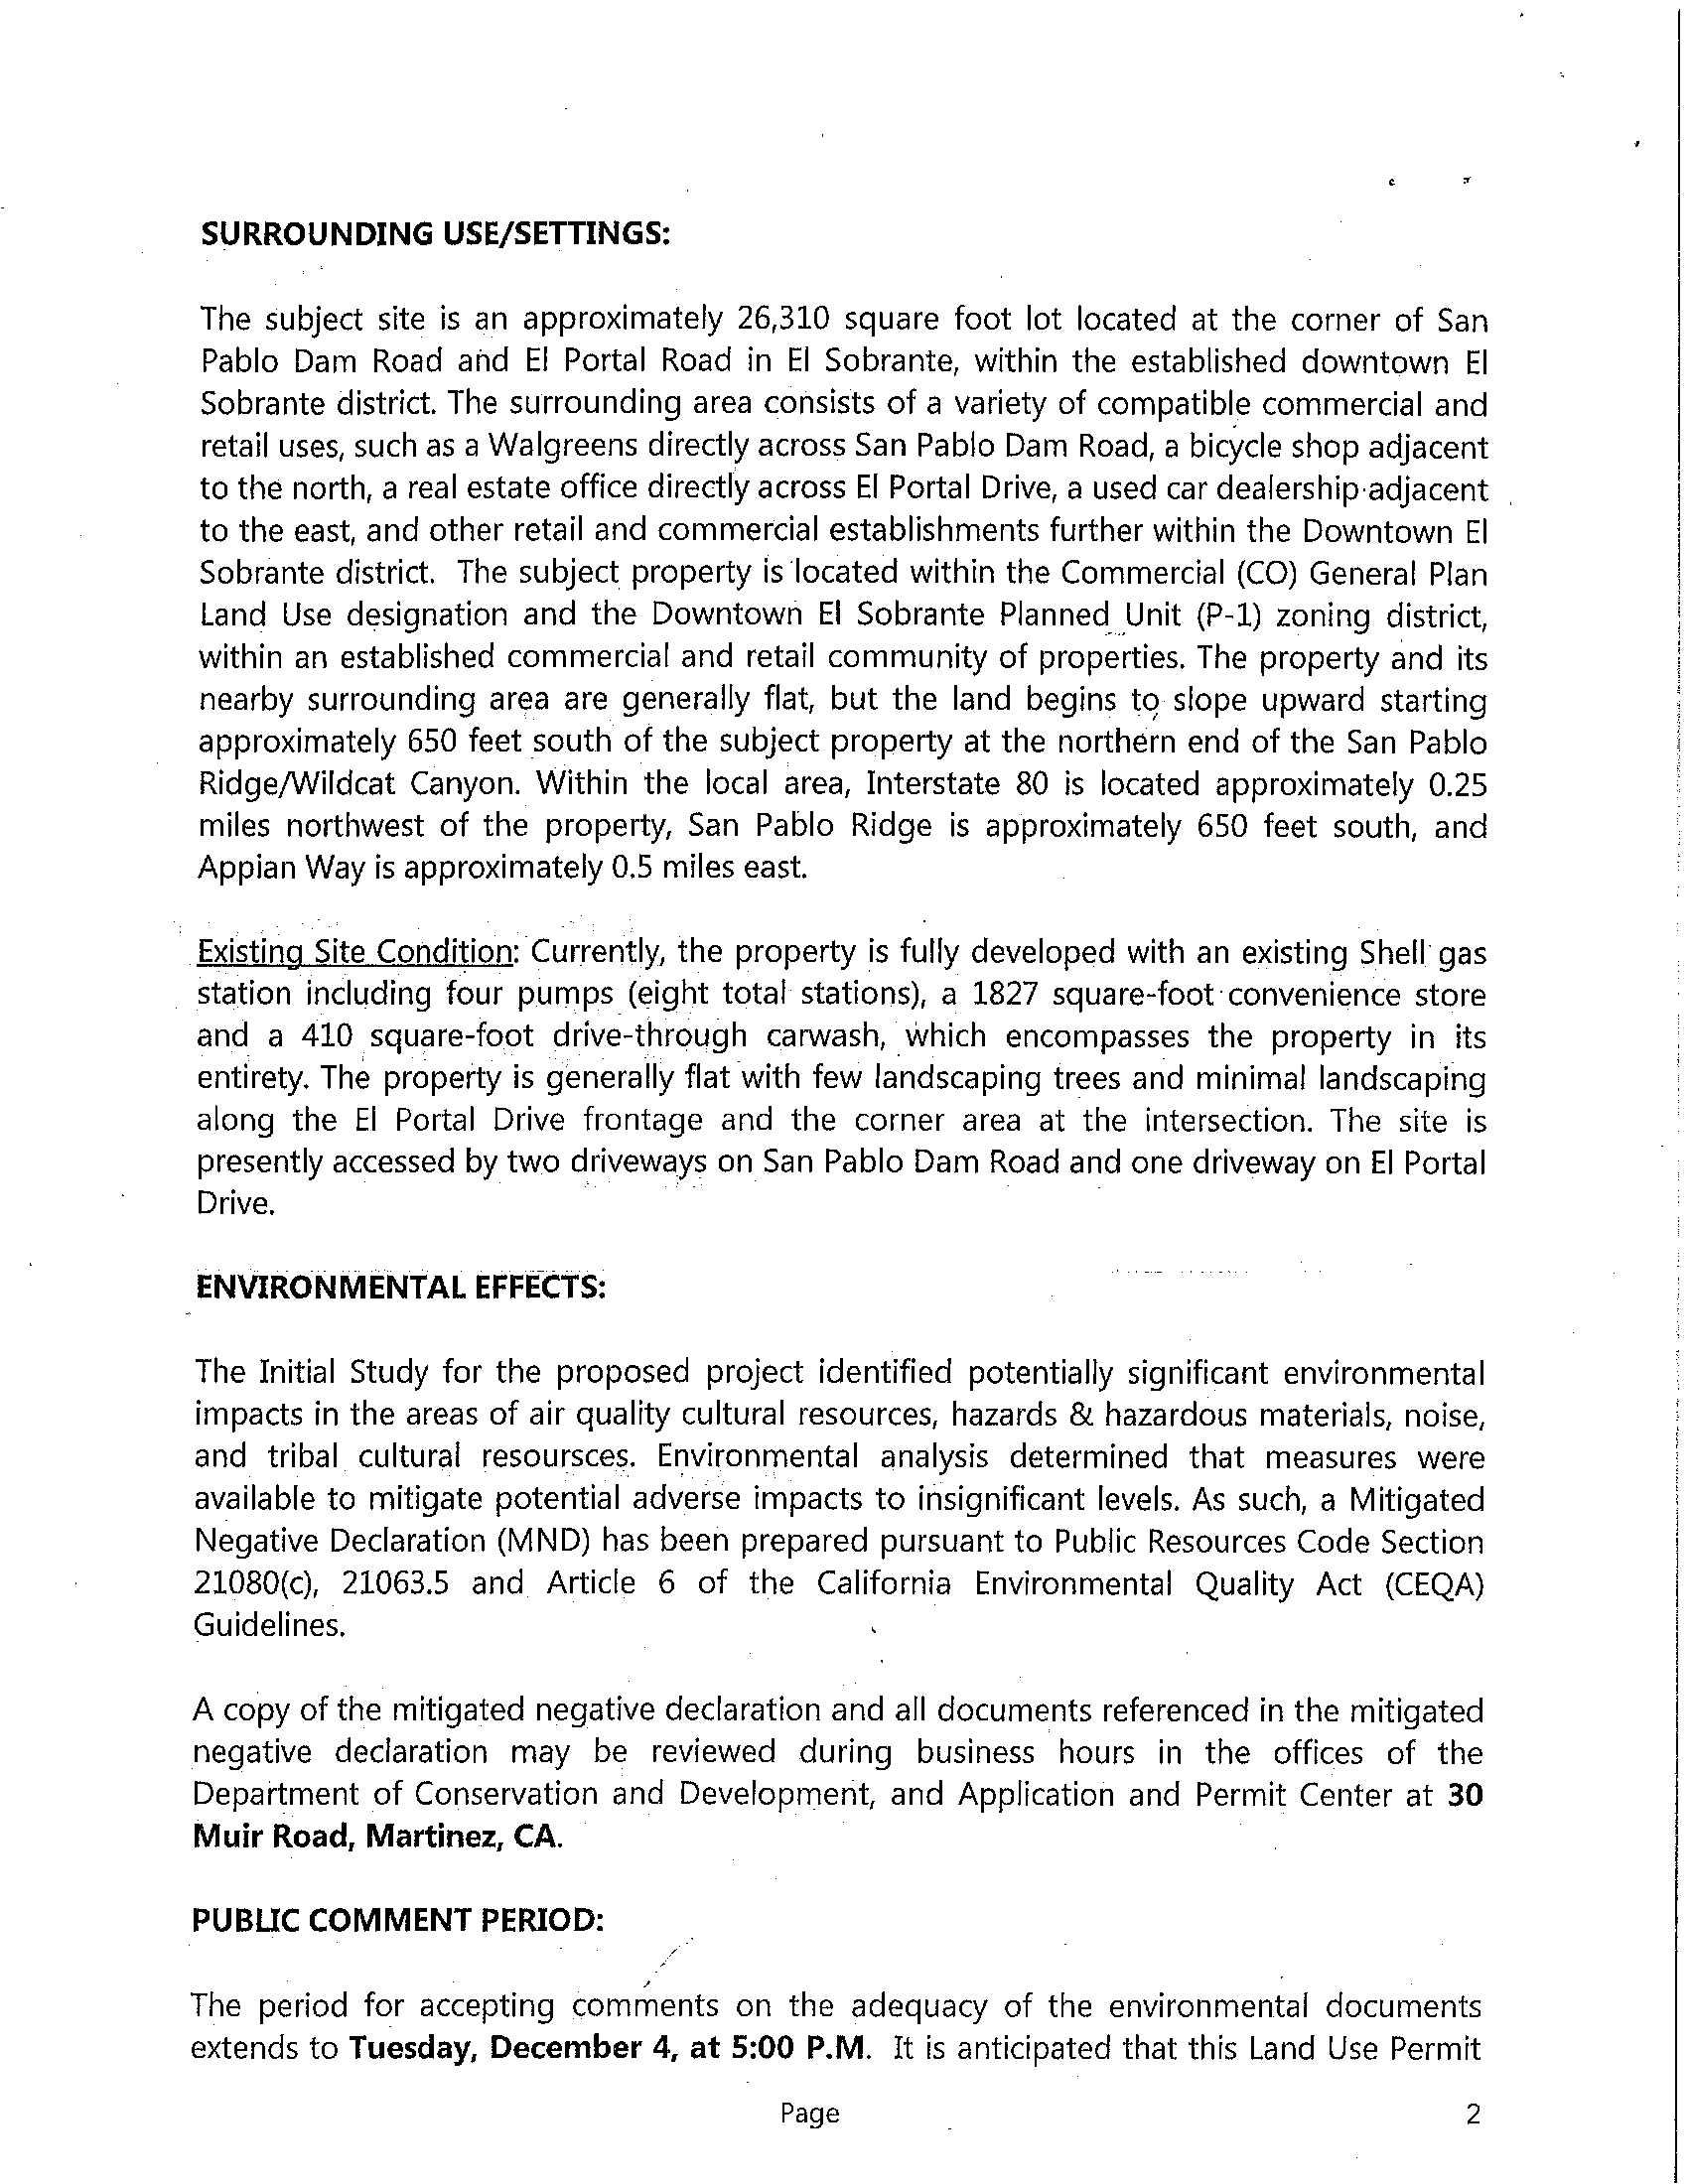 ESMAC Agenda 11.14.2018 (46 Pages)_7.jpg